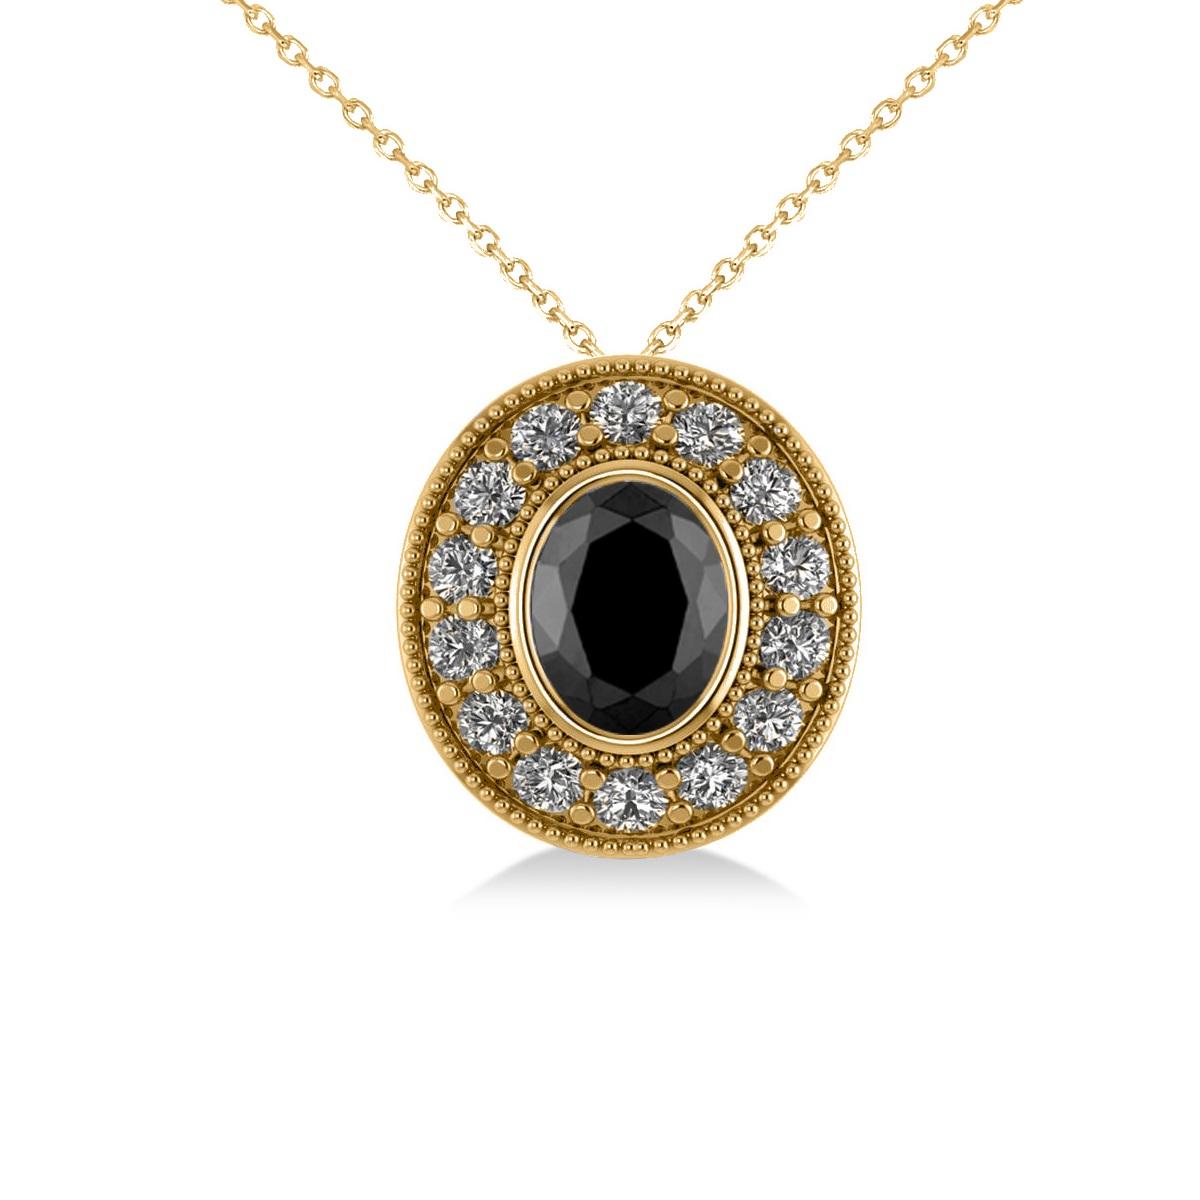 Black Diamond & Diamond Halo Oval Pendant Necklace 14k Yellow Gold (1.18ct)